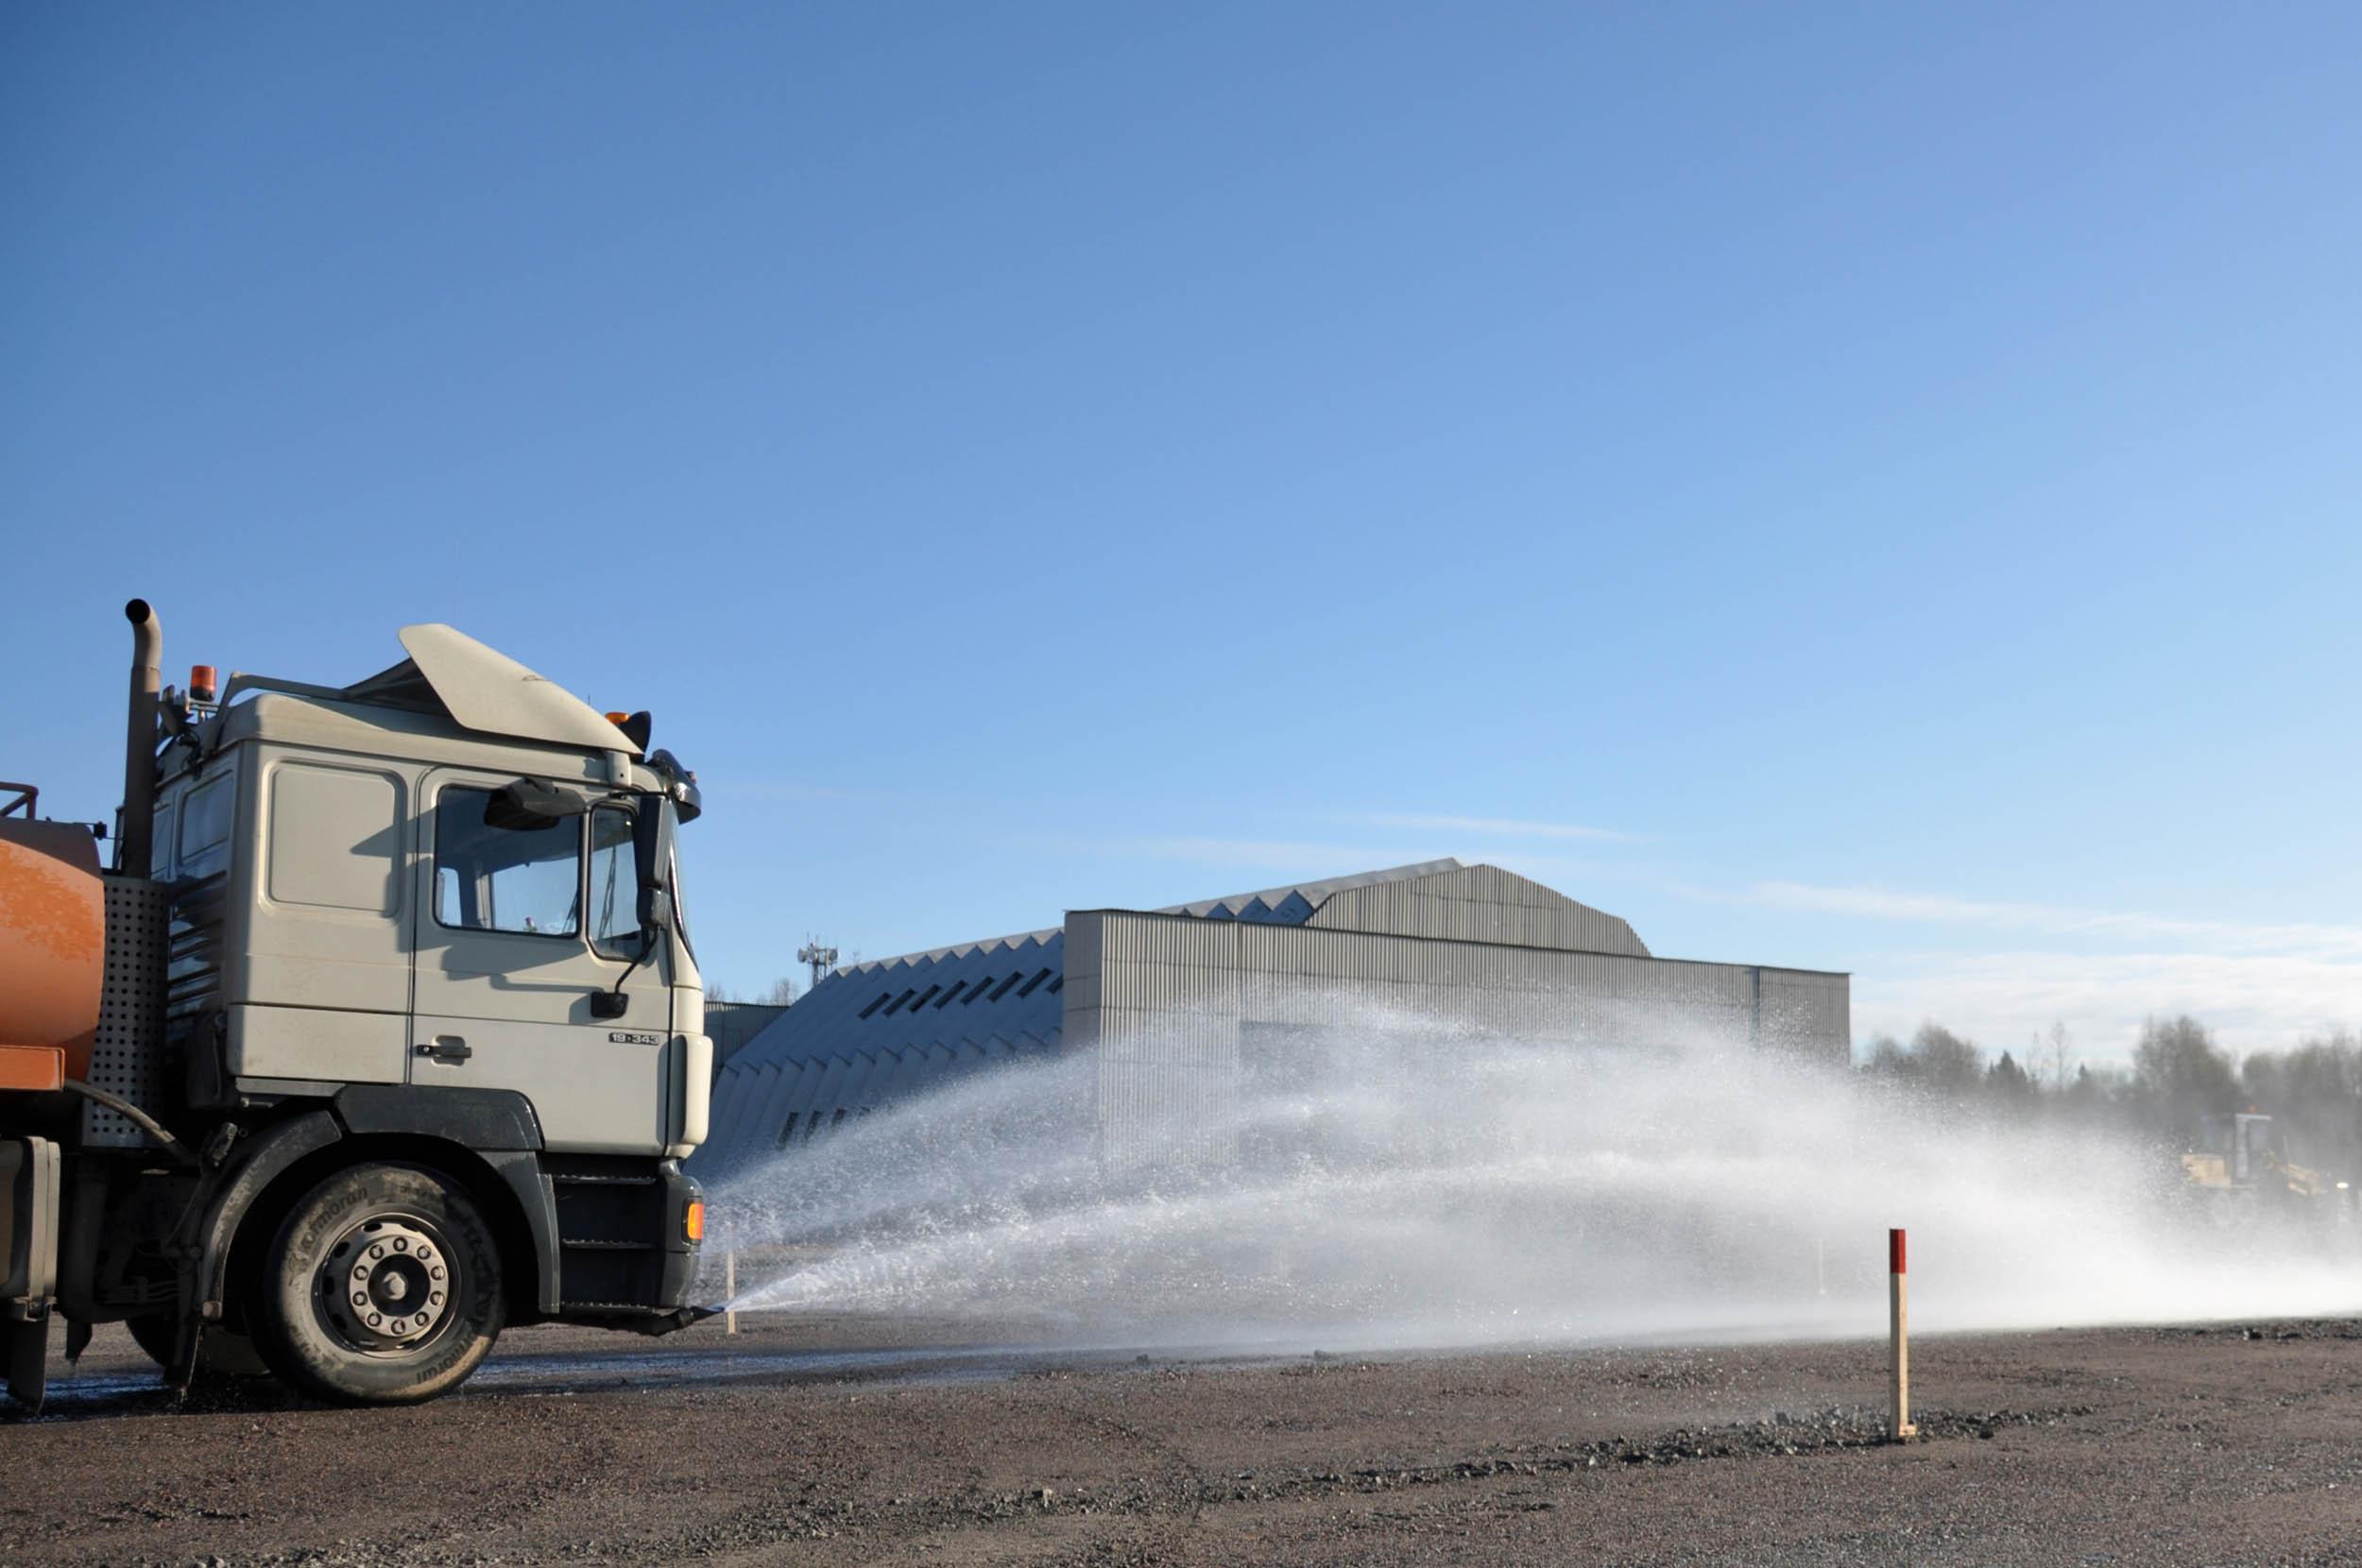 Water tank truck, Bluesky, Compaction, Machine, Machinery, HQ Photo